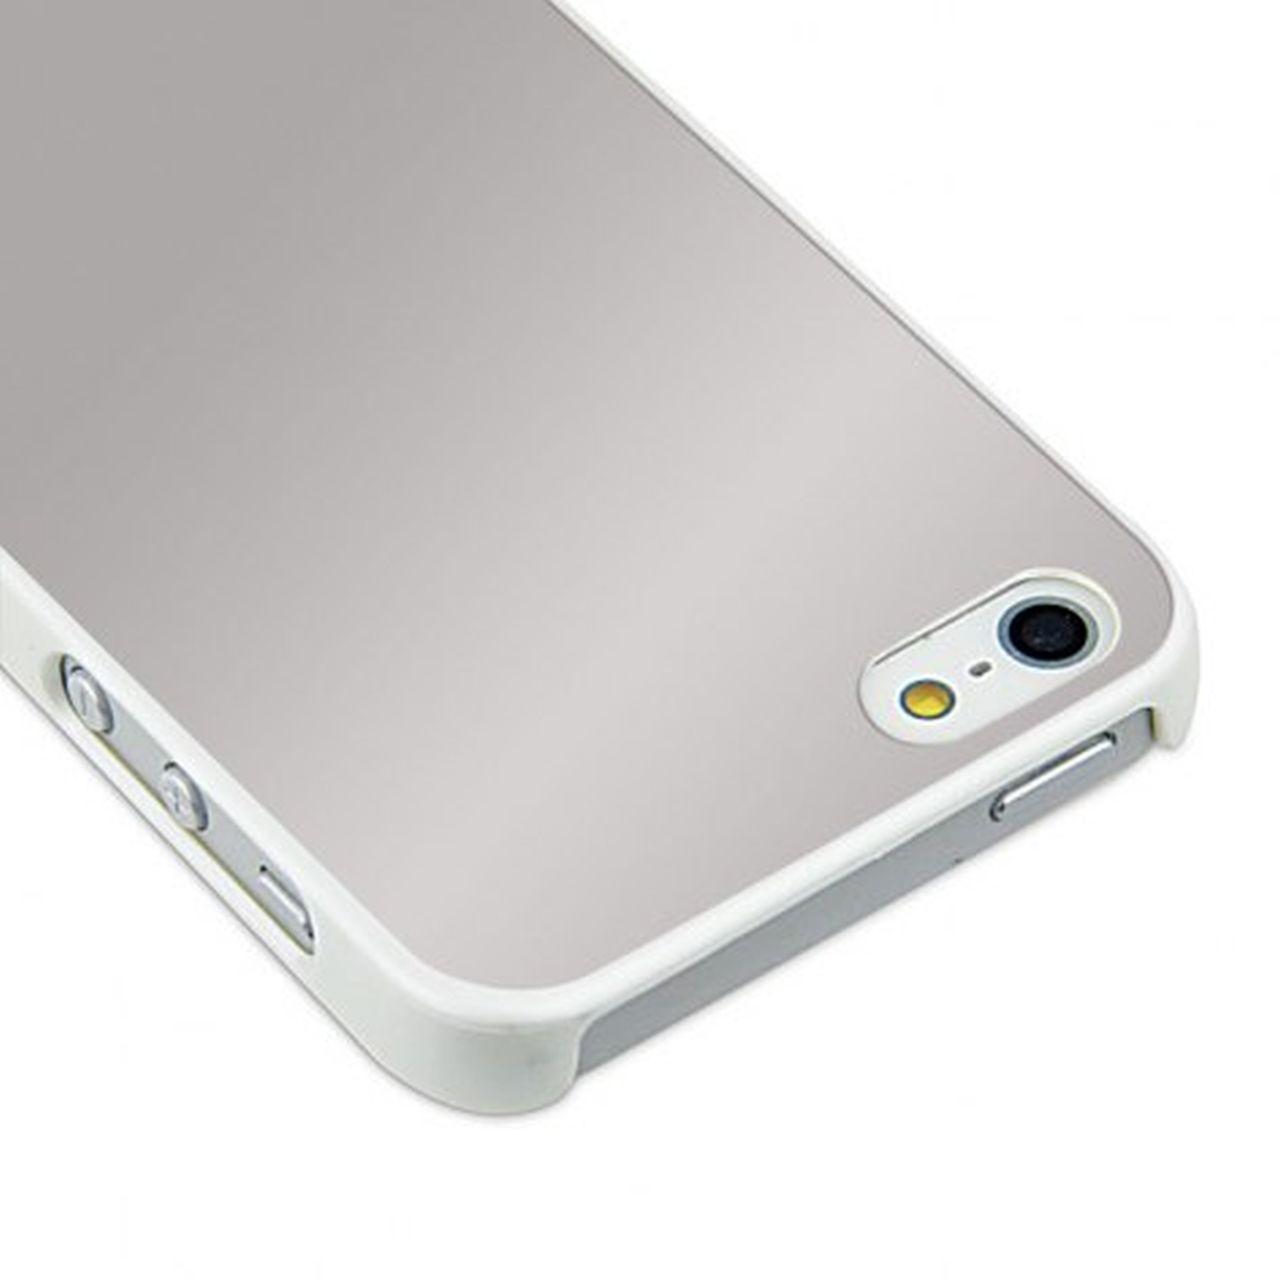 Sublicover bianca argento iphone-5 cm.13x7x1h